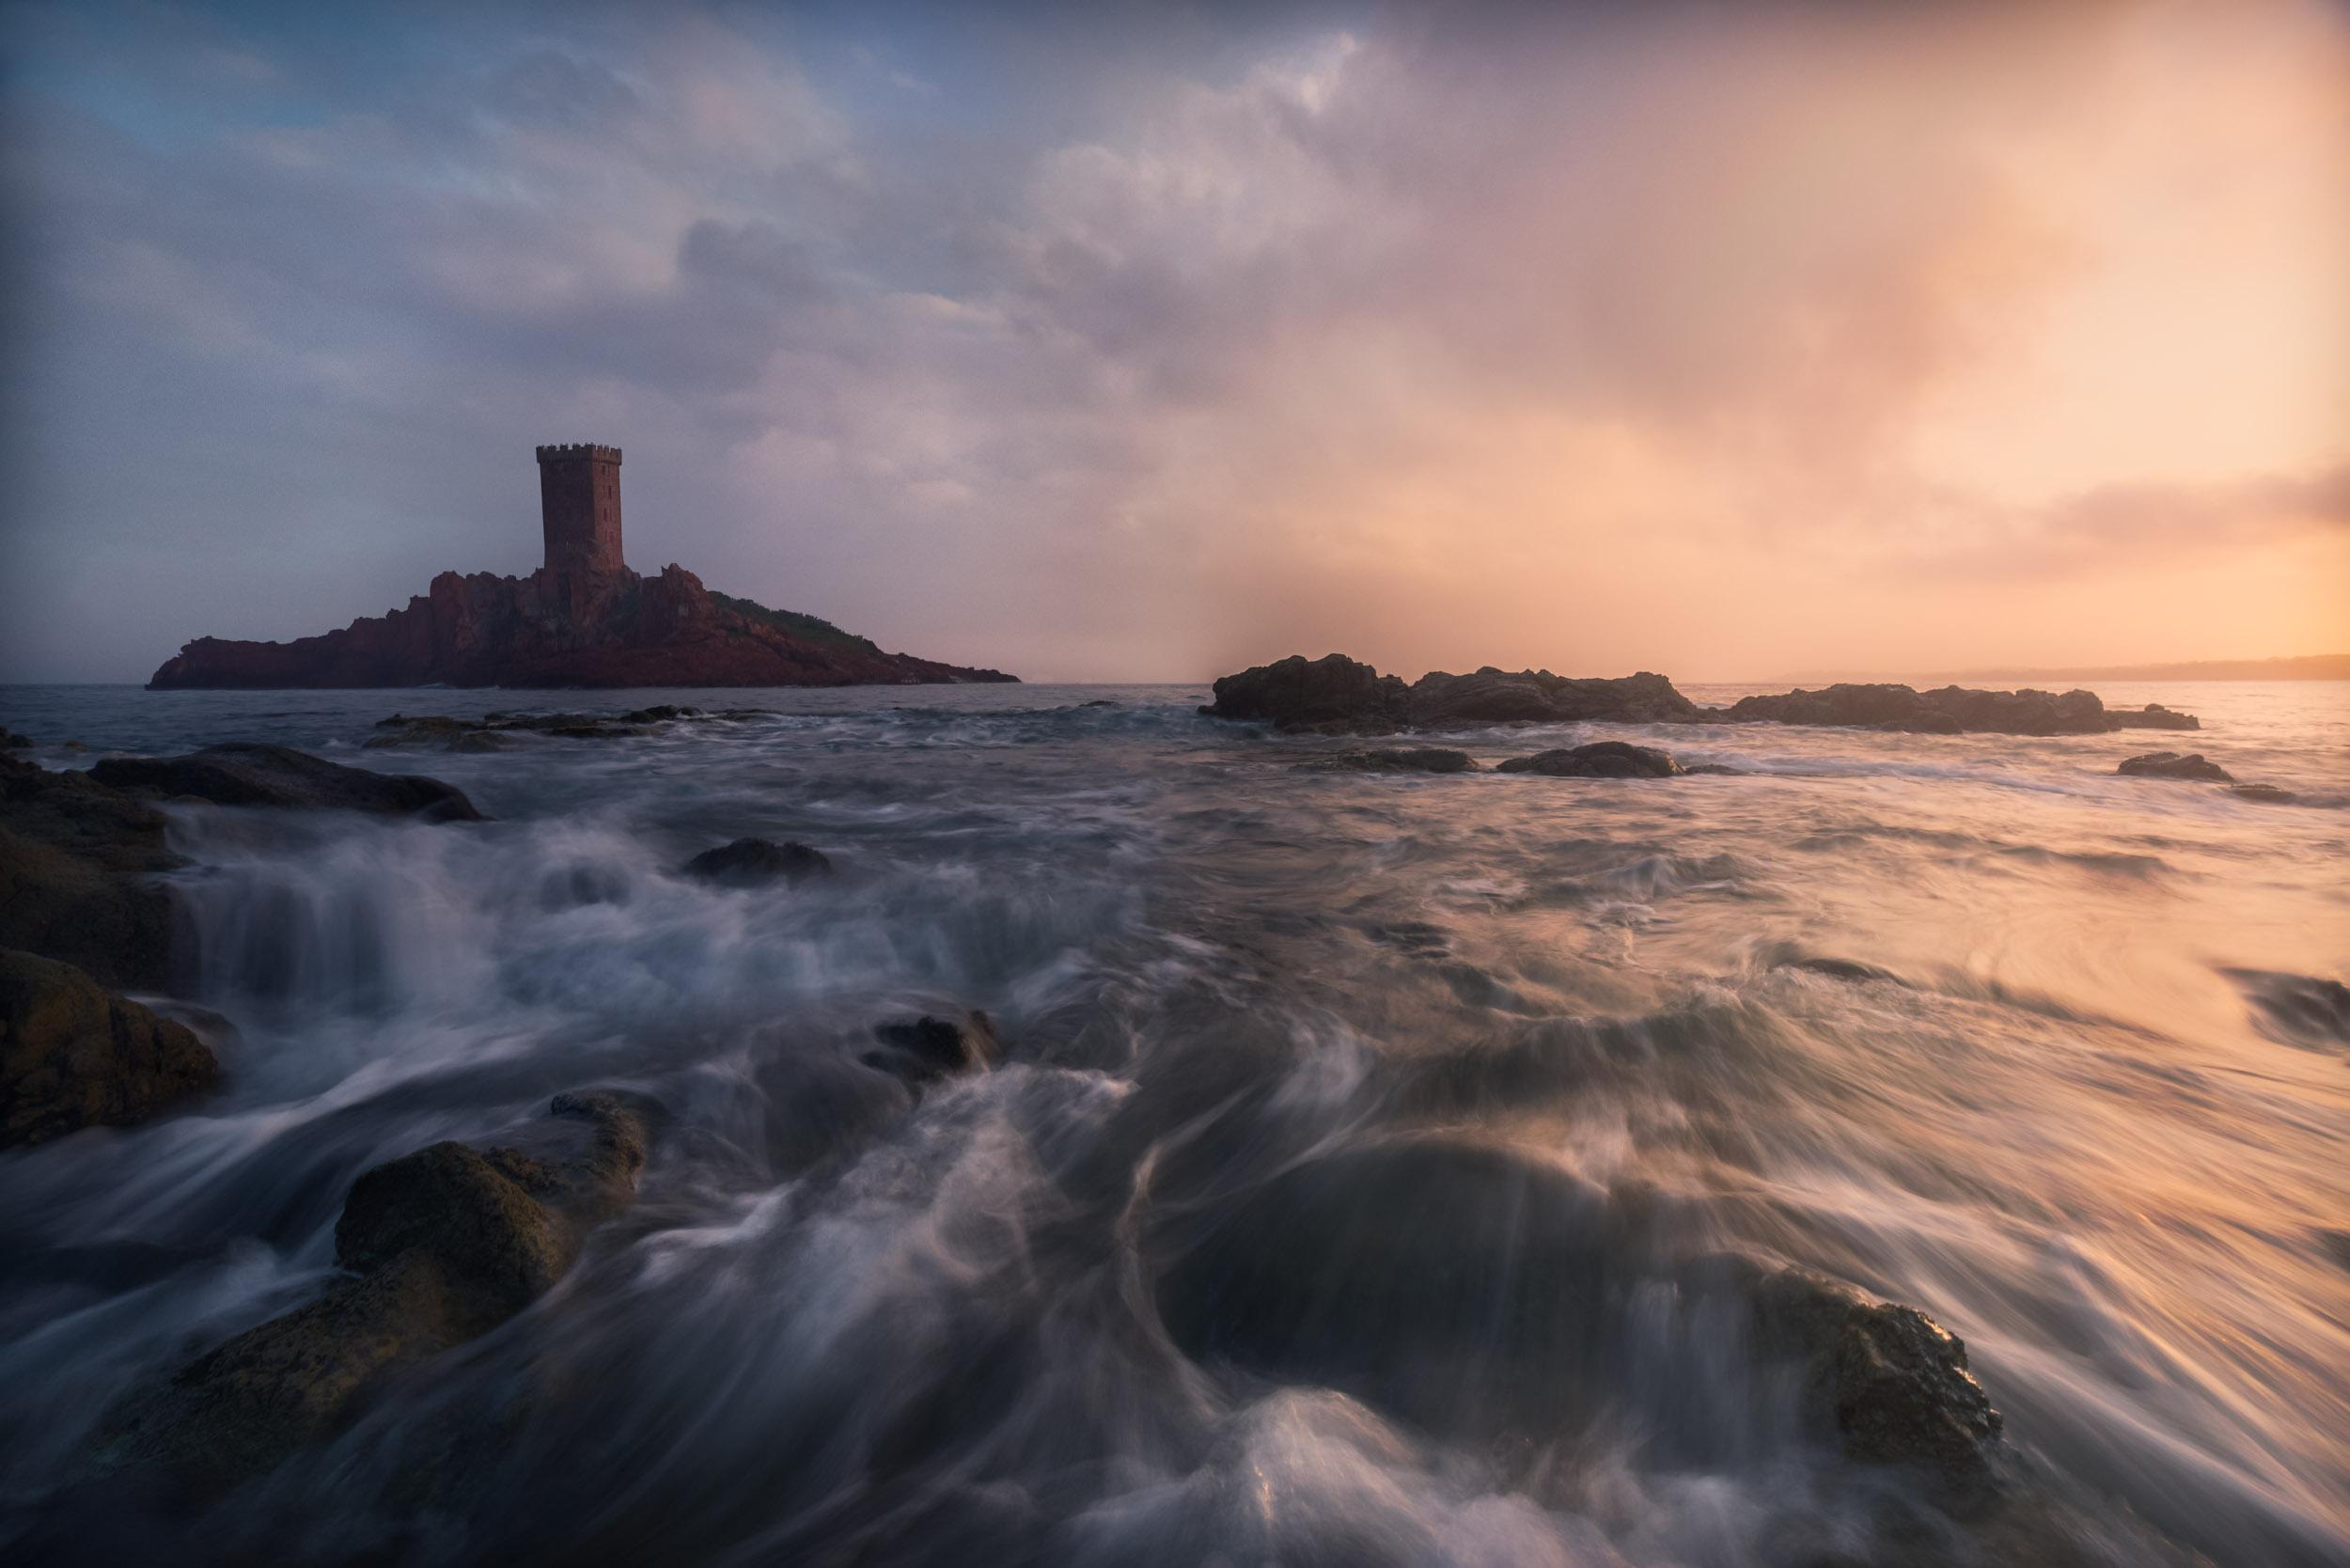 Poseidon's Fortress